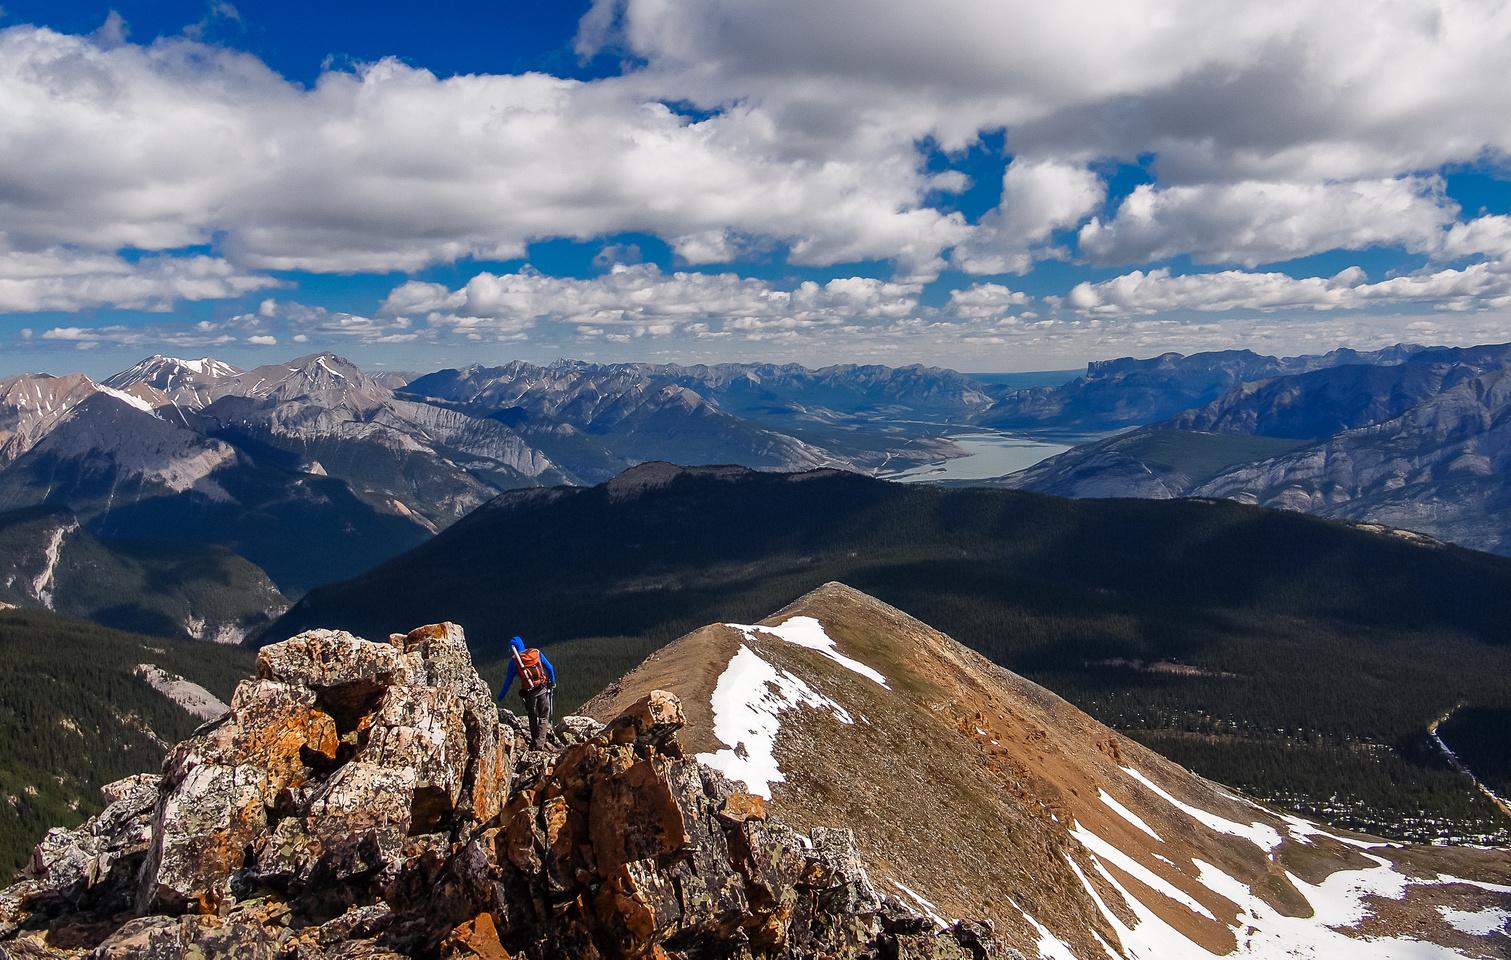 More gorgeous scenery on the ridge.